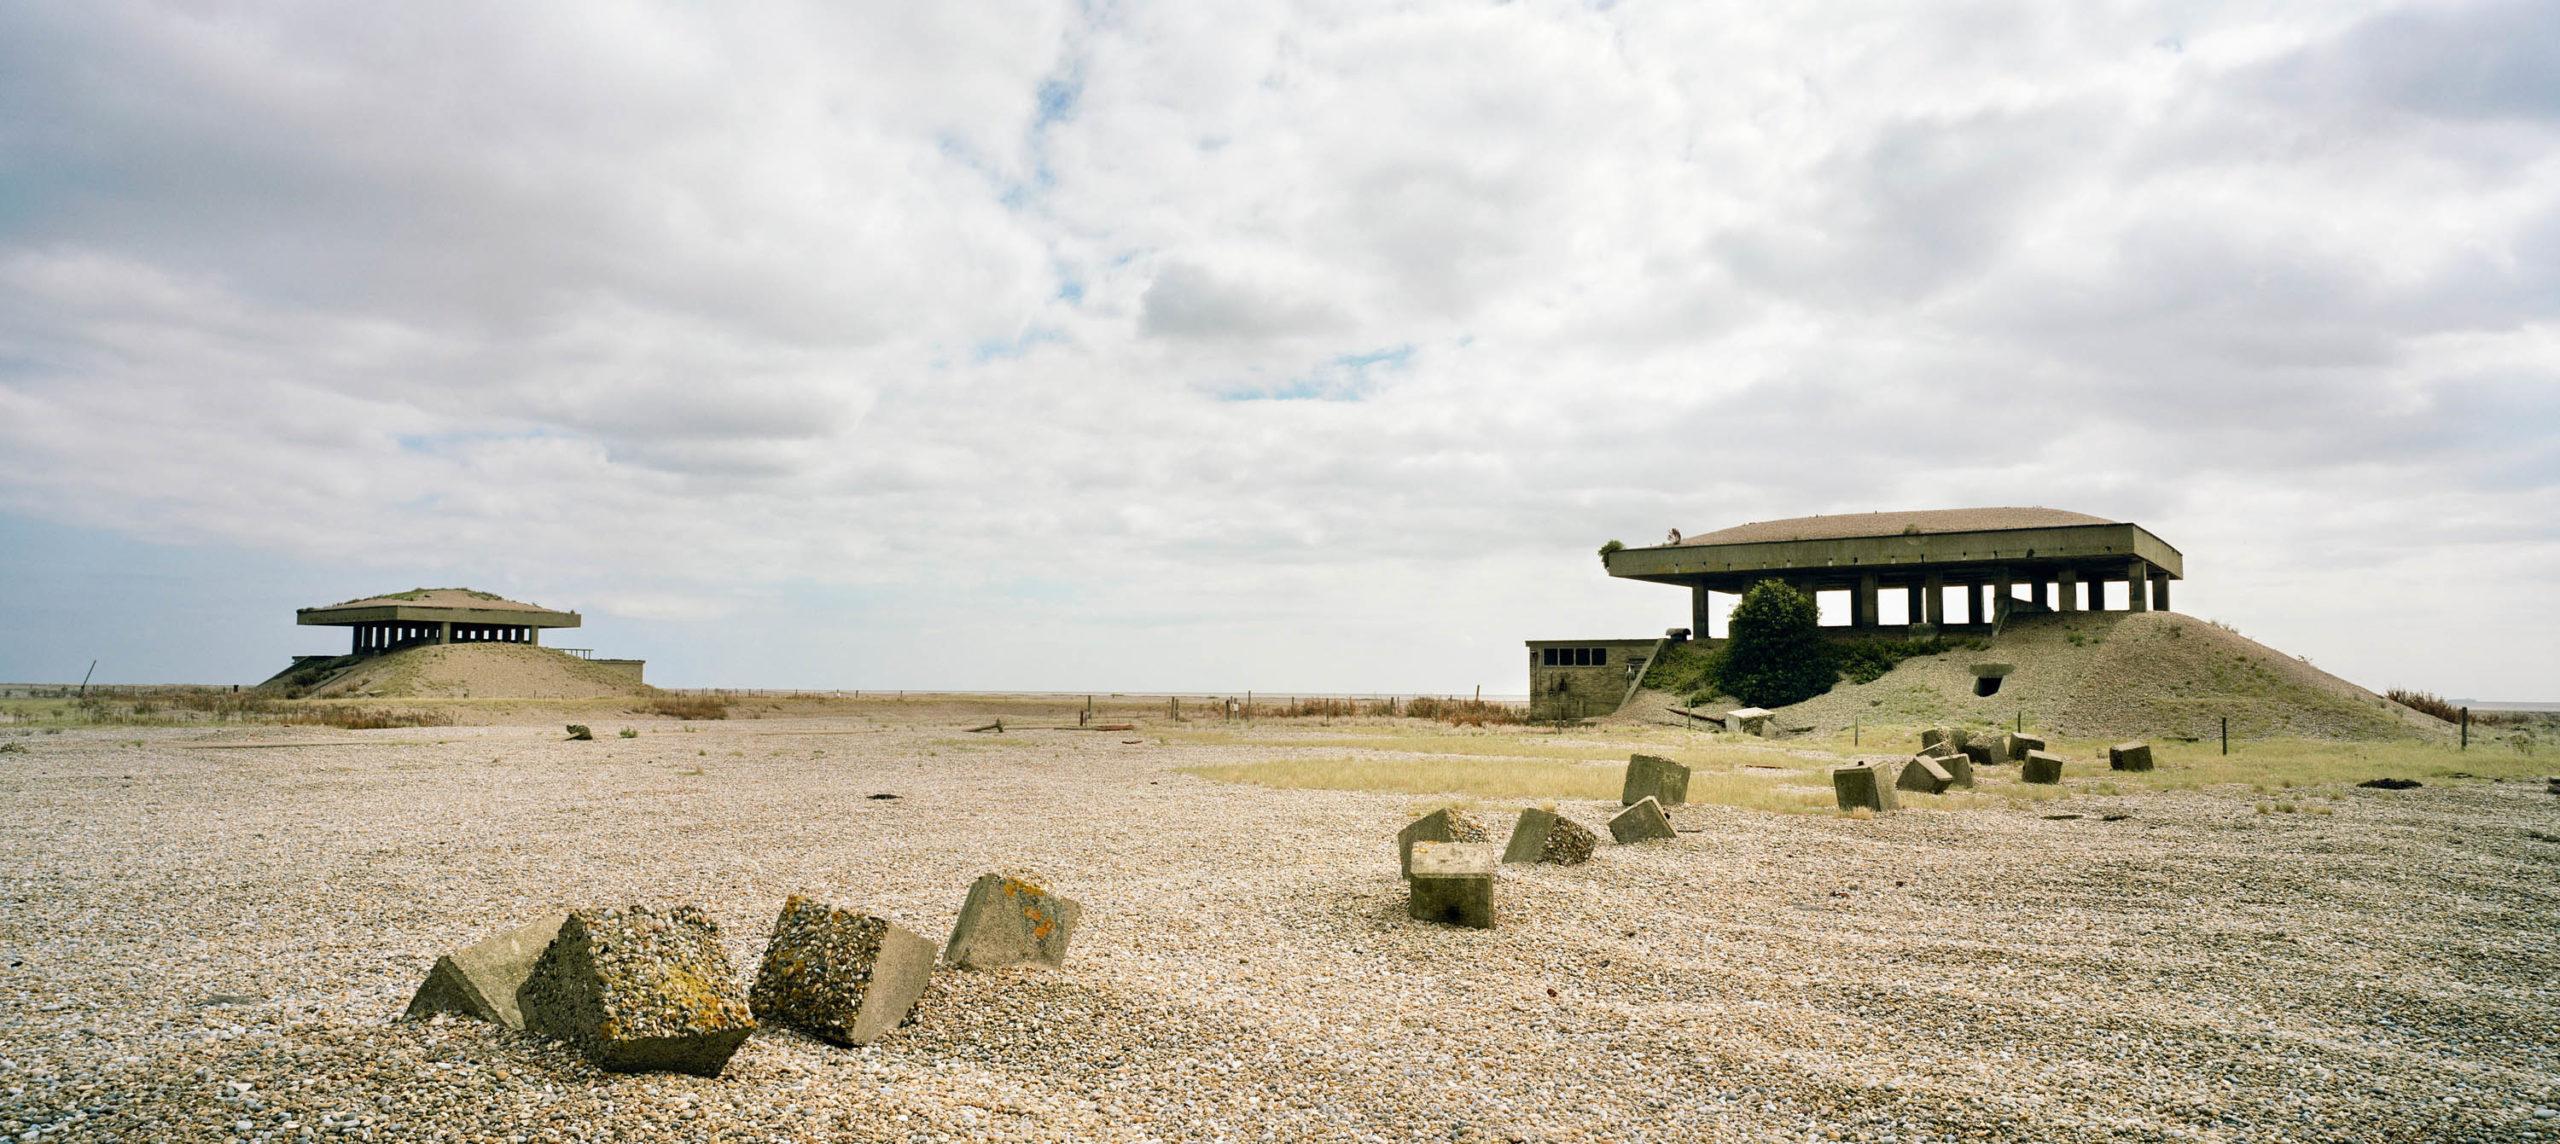 United Kingdom. Atomic bomb test laboratory